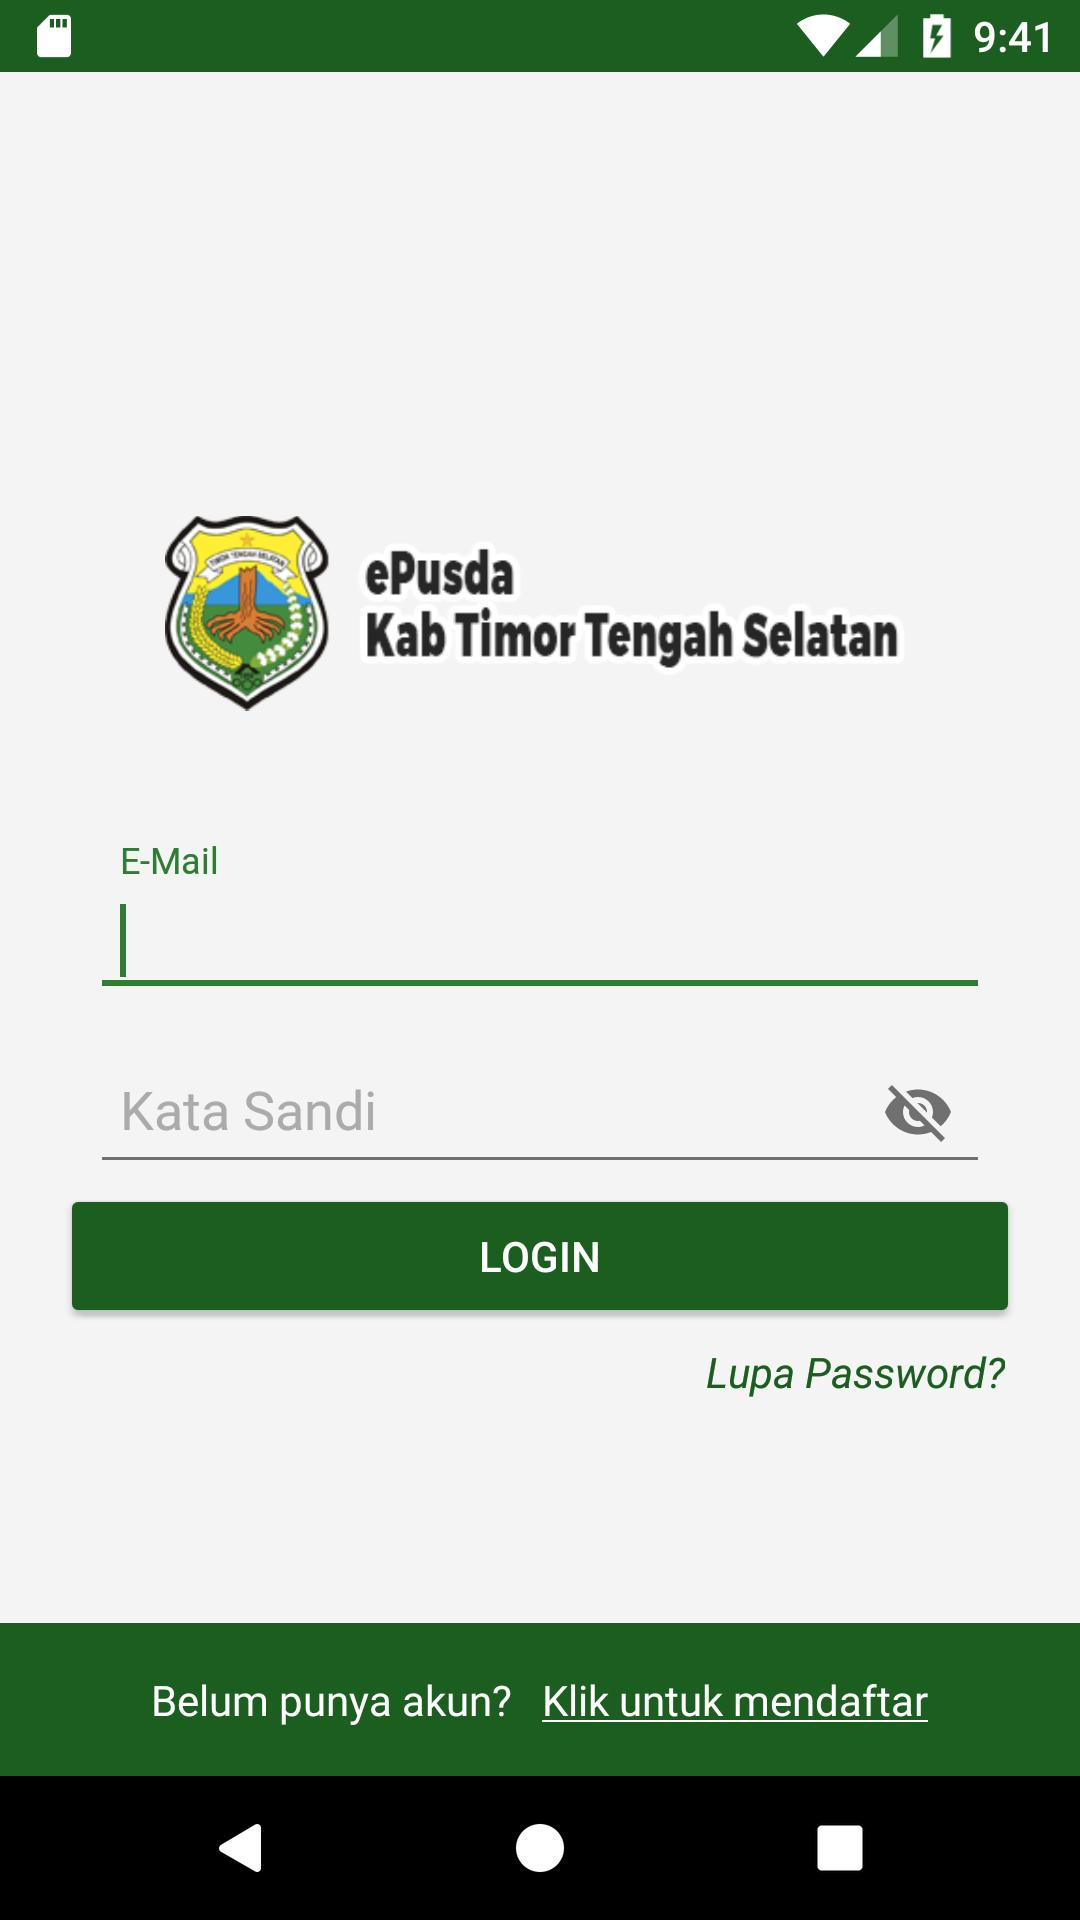 Epusda Kab Timor Tengah Selatan For Android Apk Download